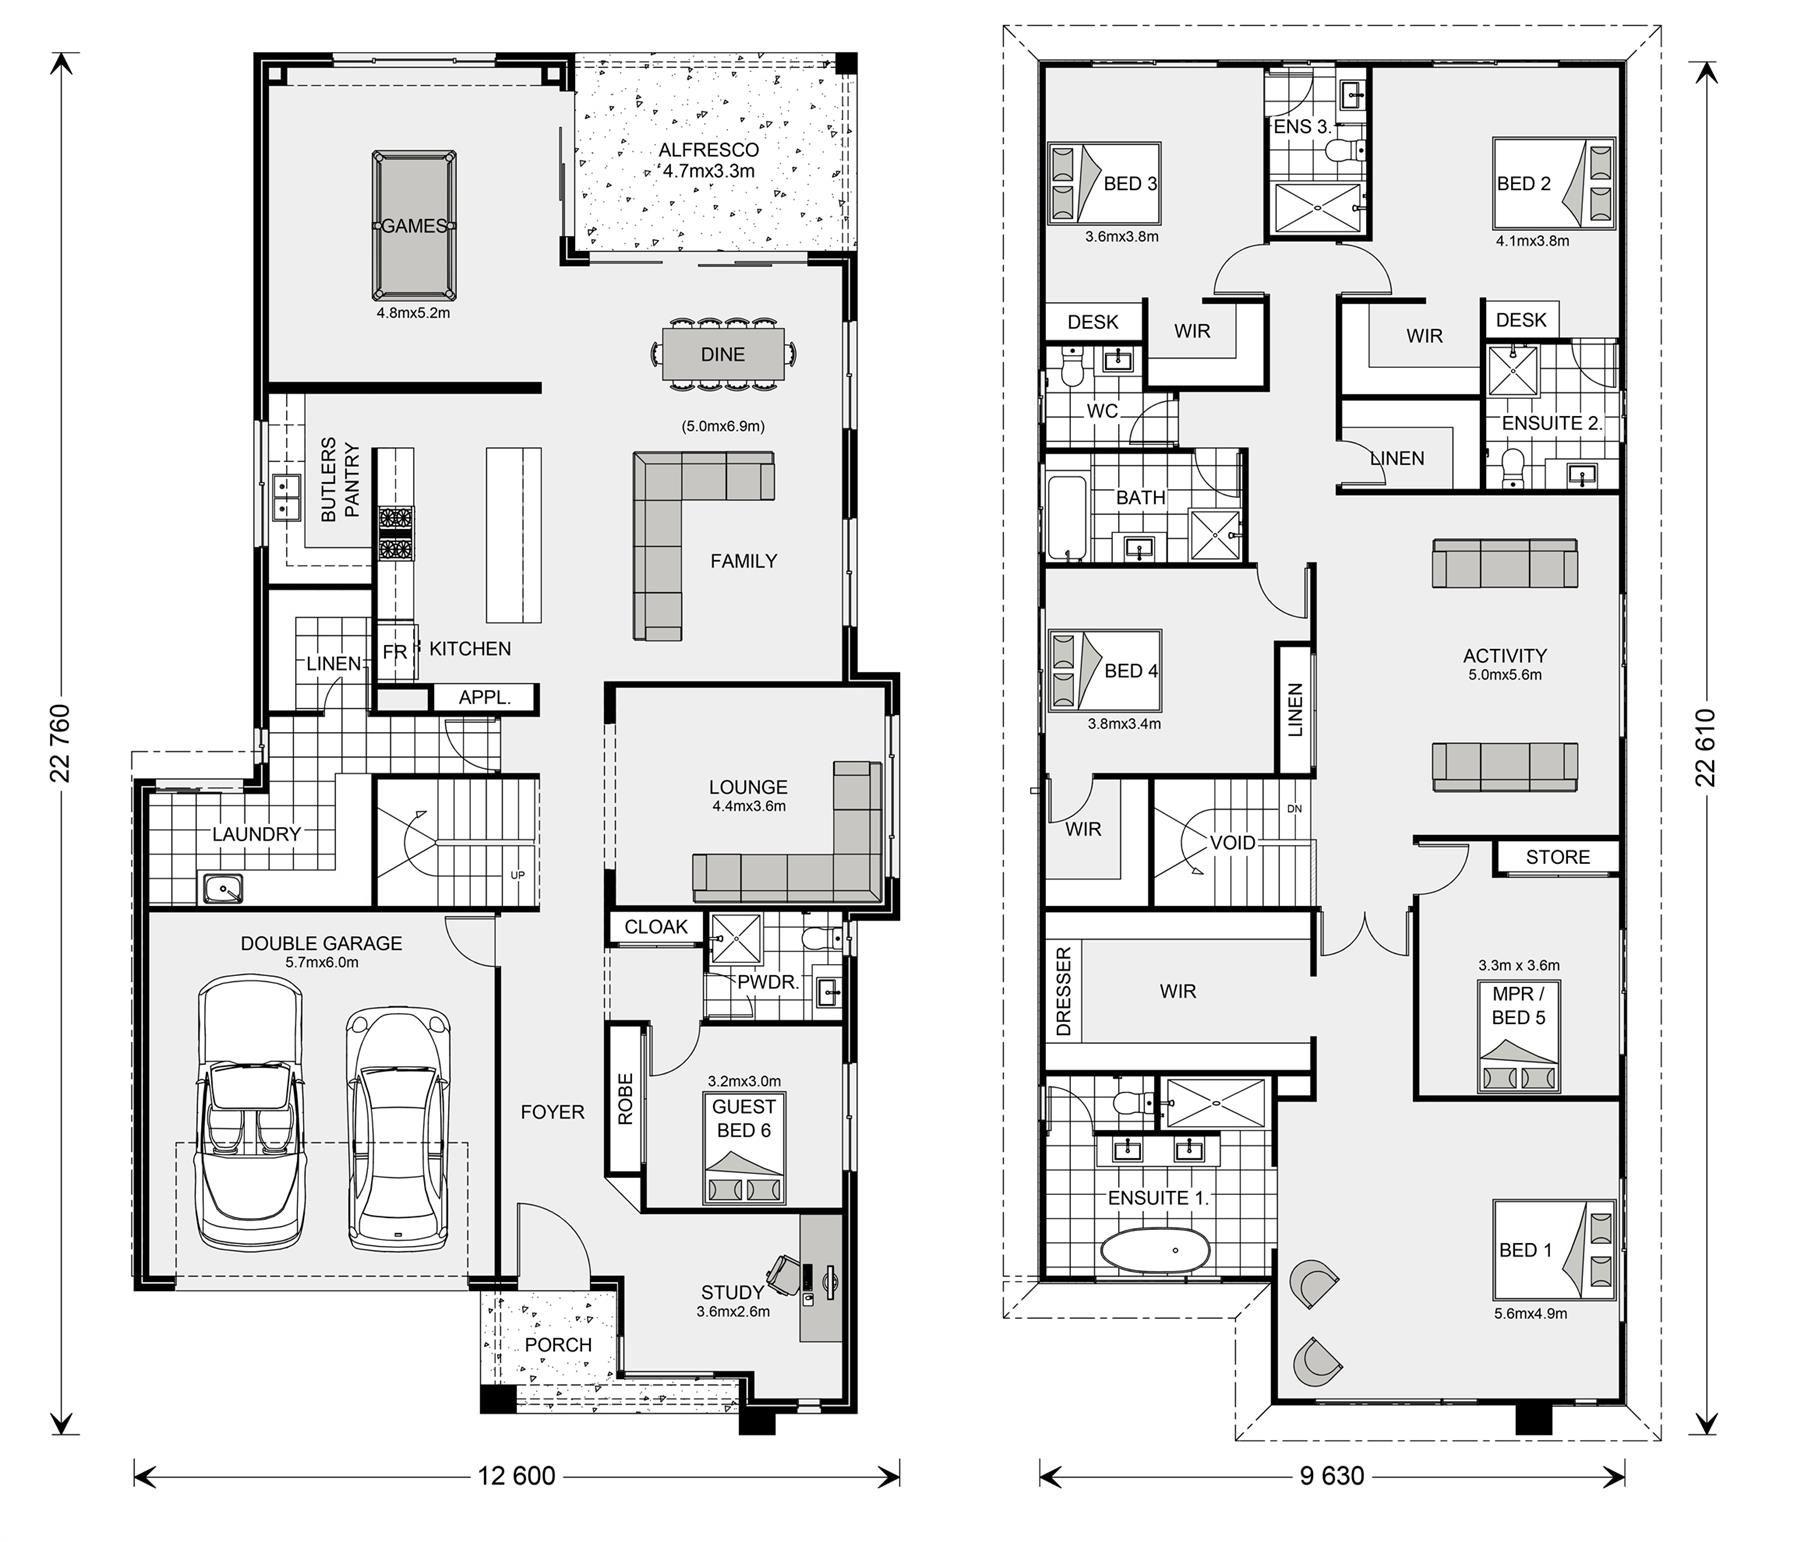 Manhattan 247 Design Ideas Home Designs In G J Gardner Homes Double Storey House Plans 6 Bedroom House Plans Family House Plans